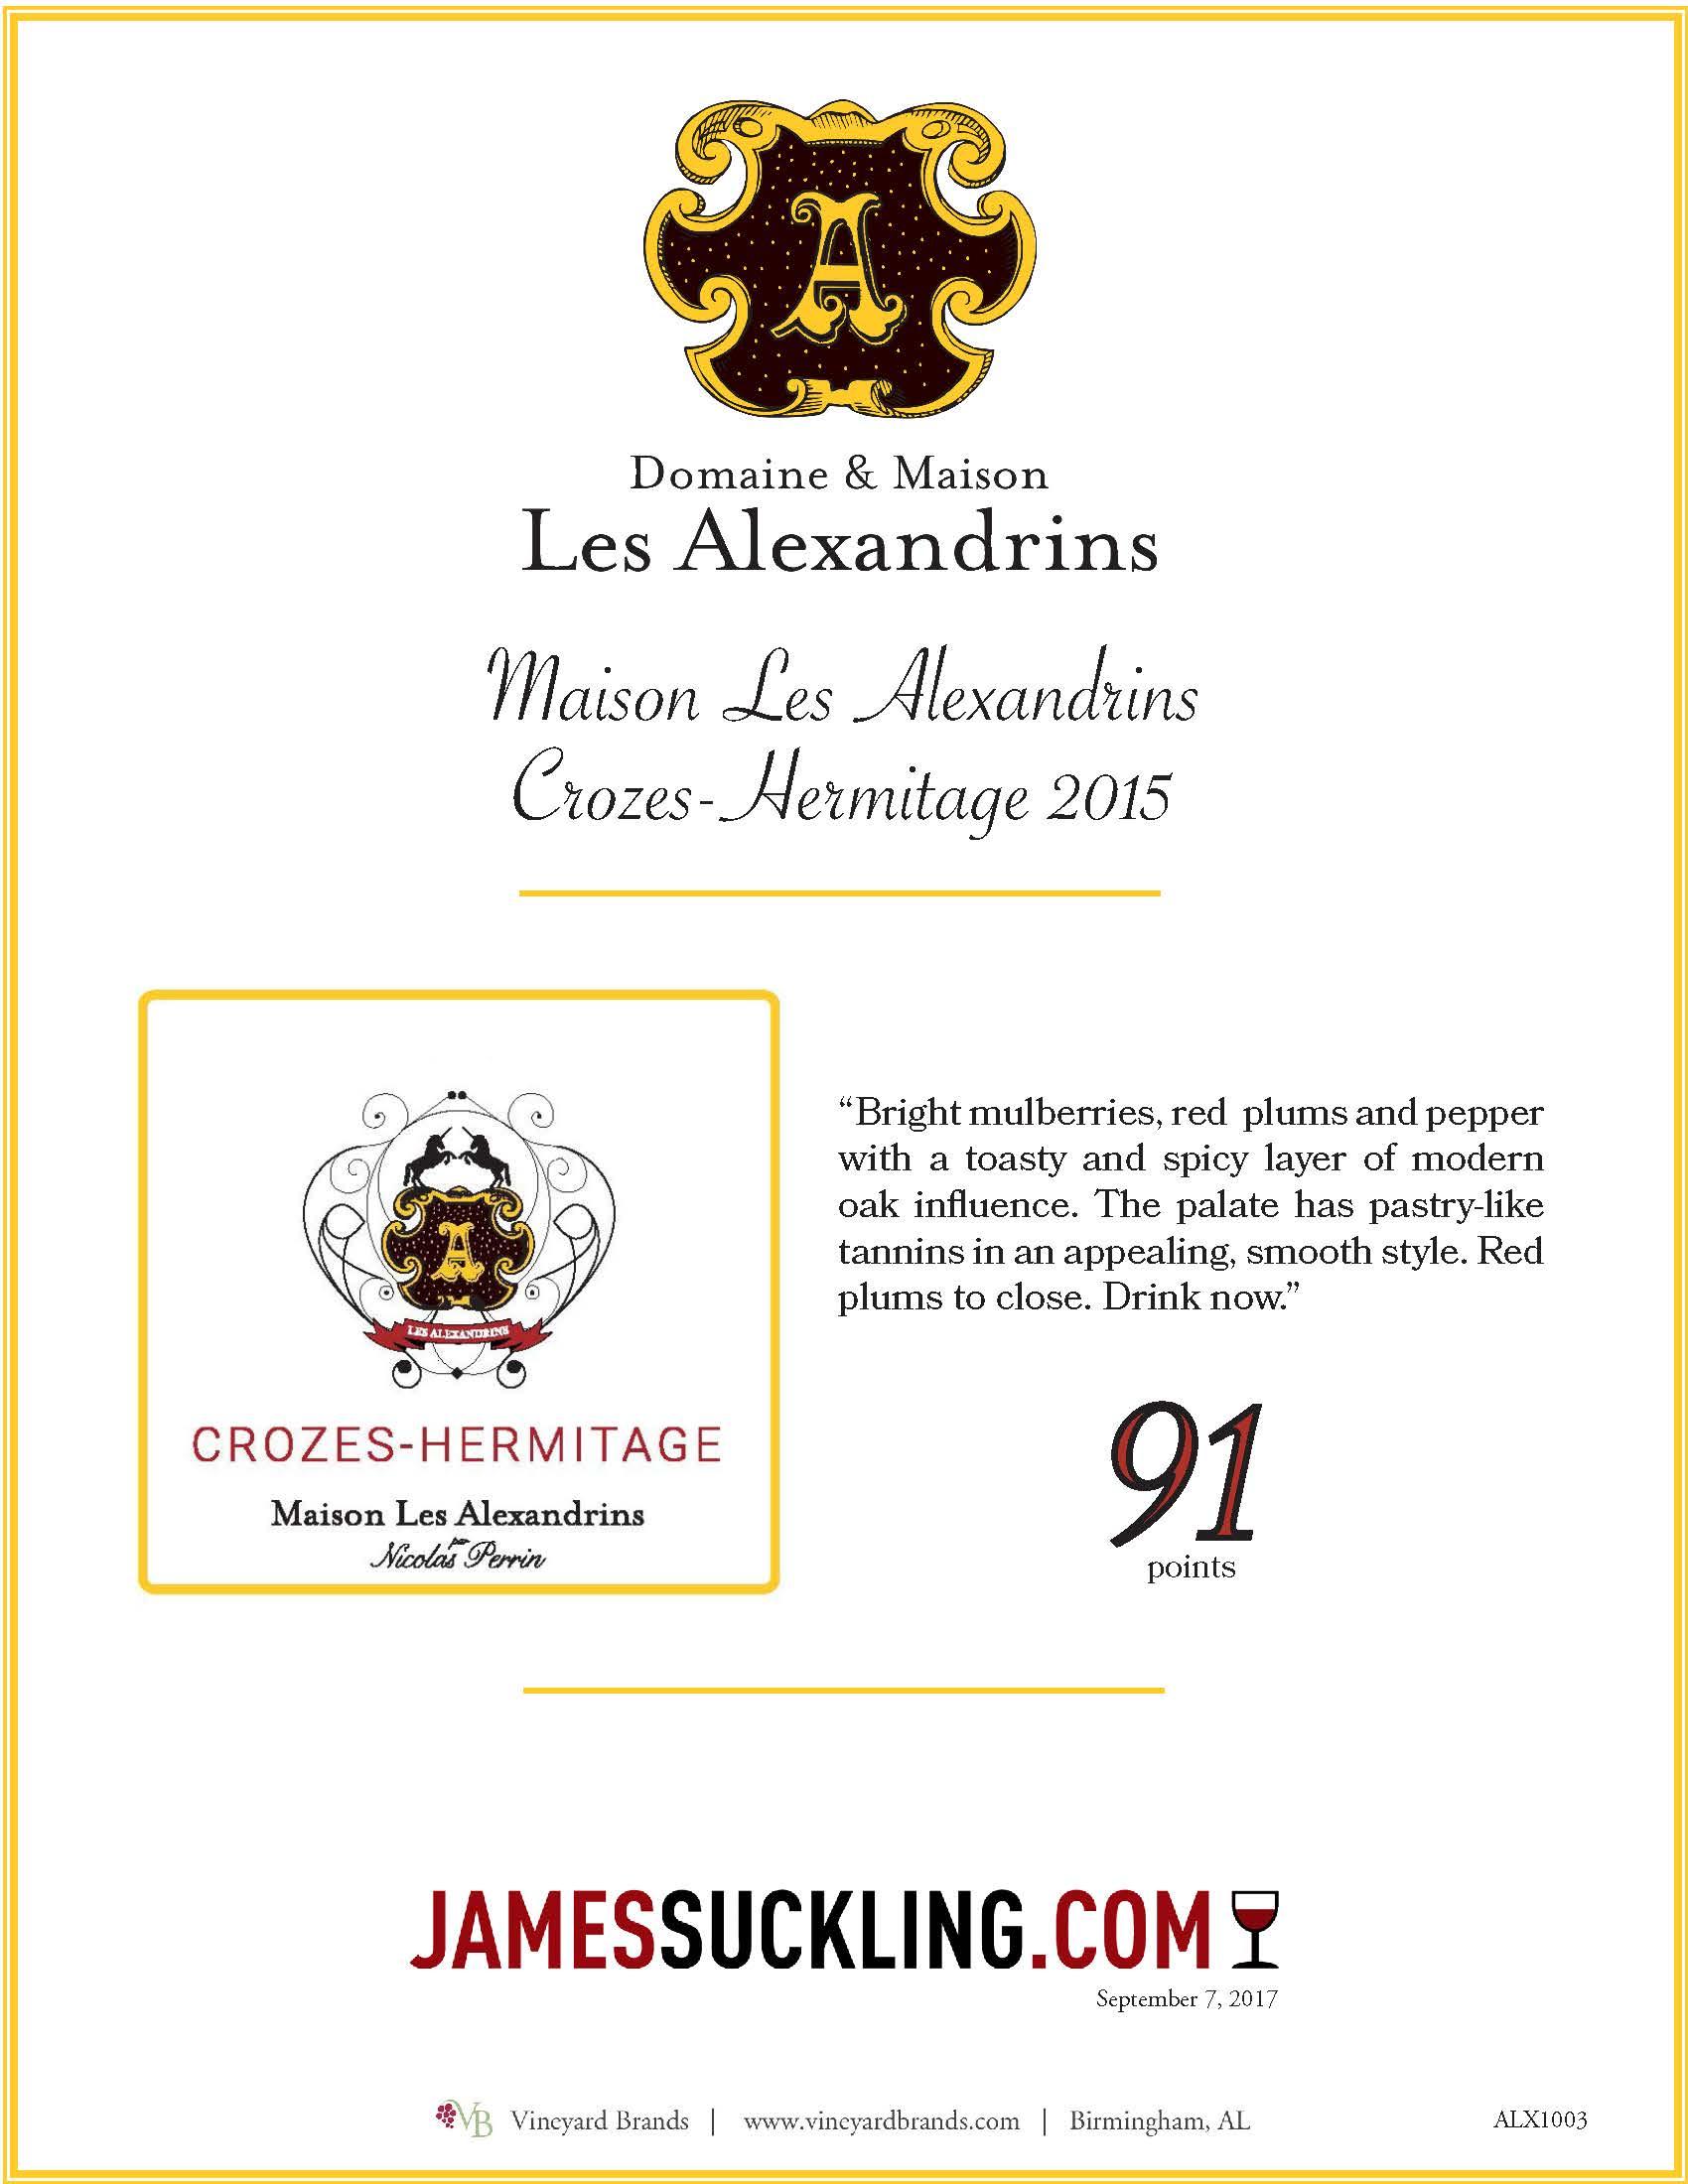 Maison Les Alexandrins Crozes Hermitage 2015.jpg